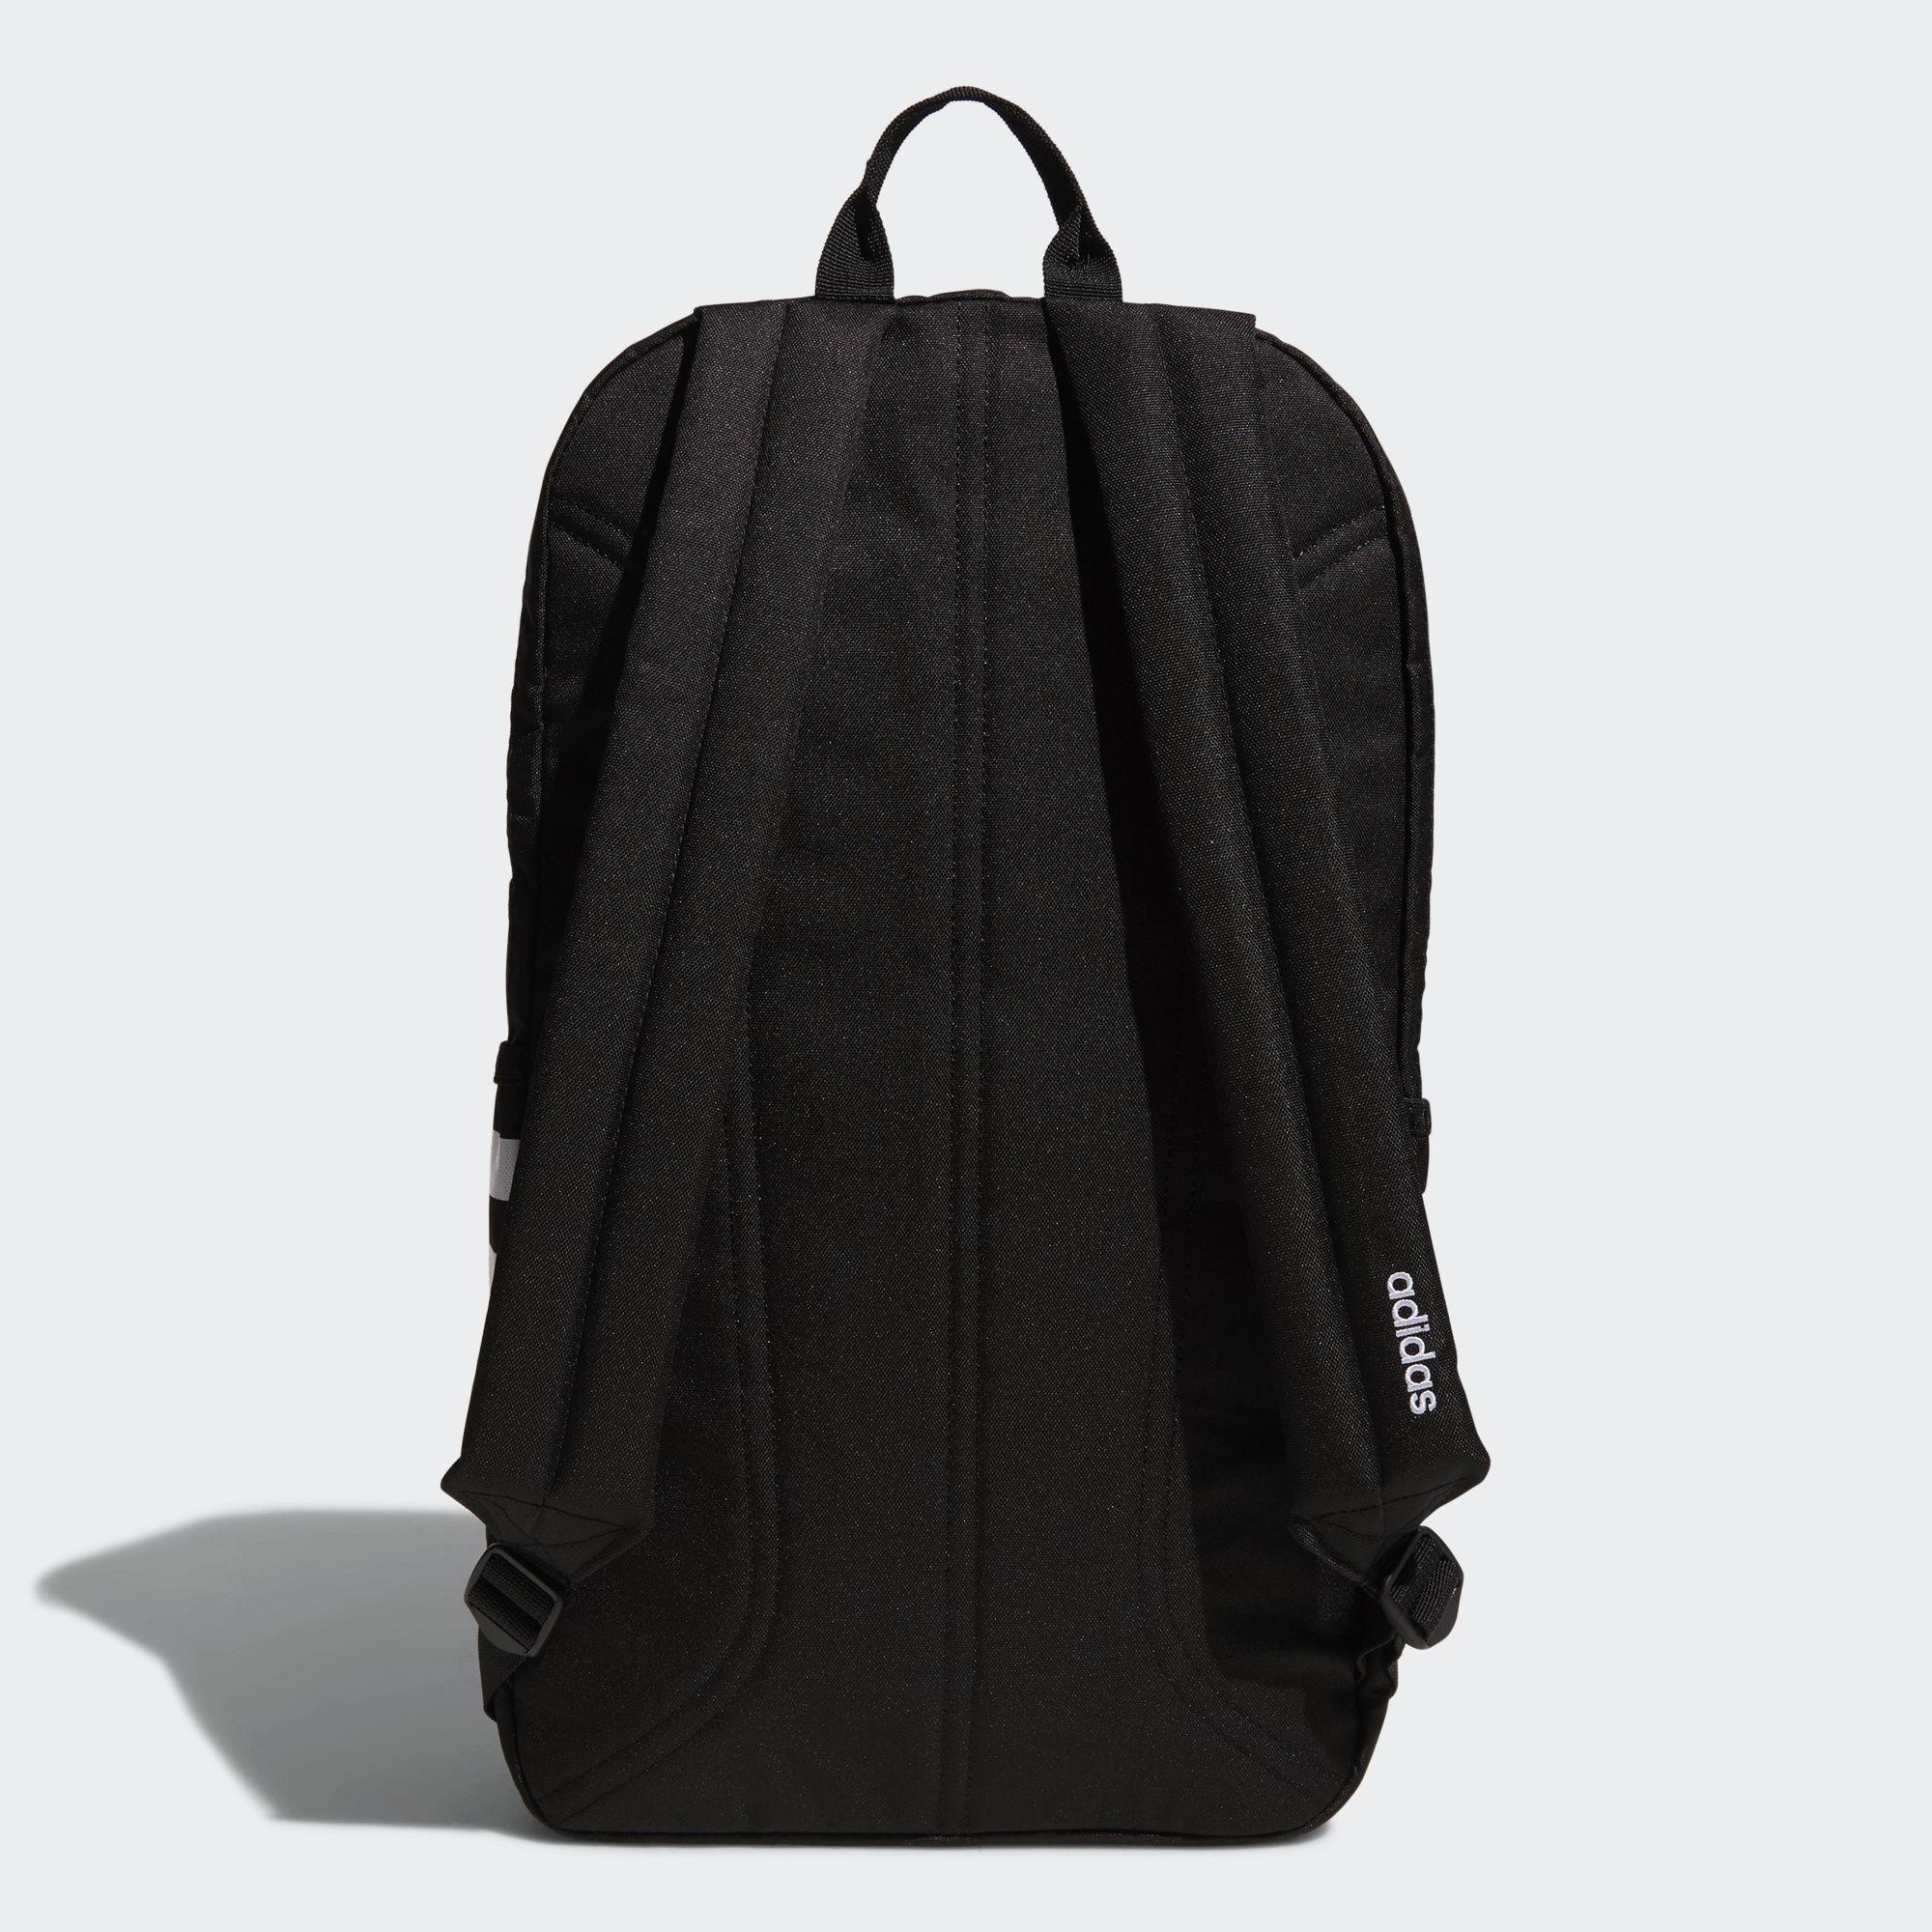 3ebf76e839 adidas Jay Backpack XL Purple Gray Deluxe ORG ... - Pinterest. NWT ADIDAS  RYDELL SLING ...